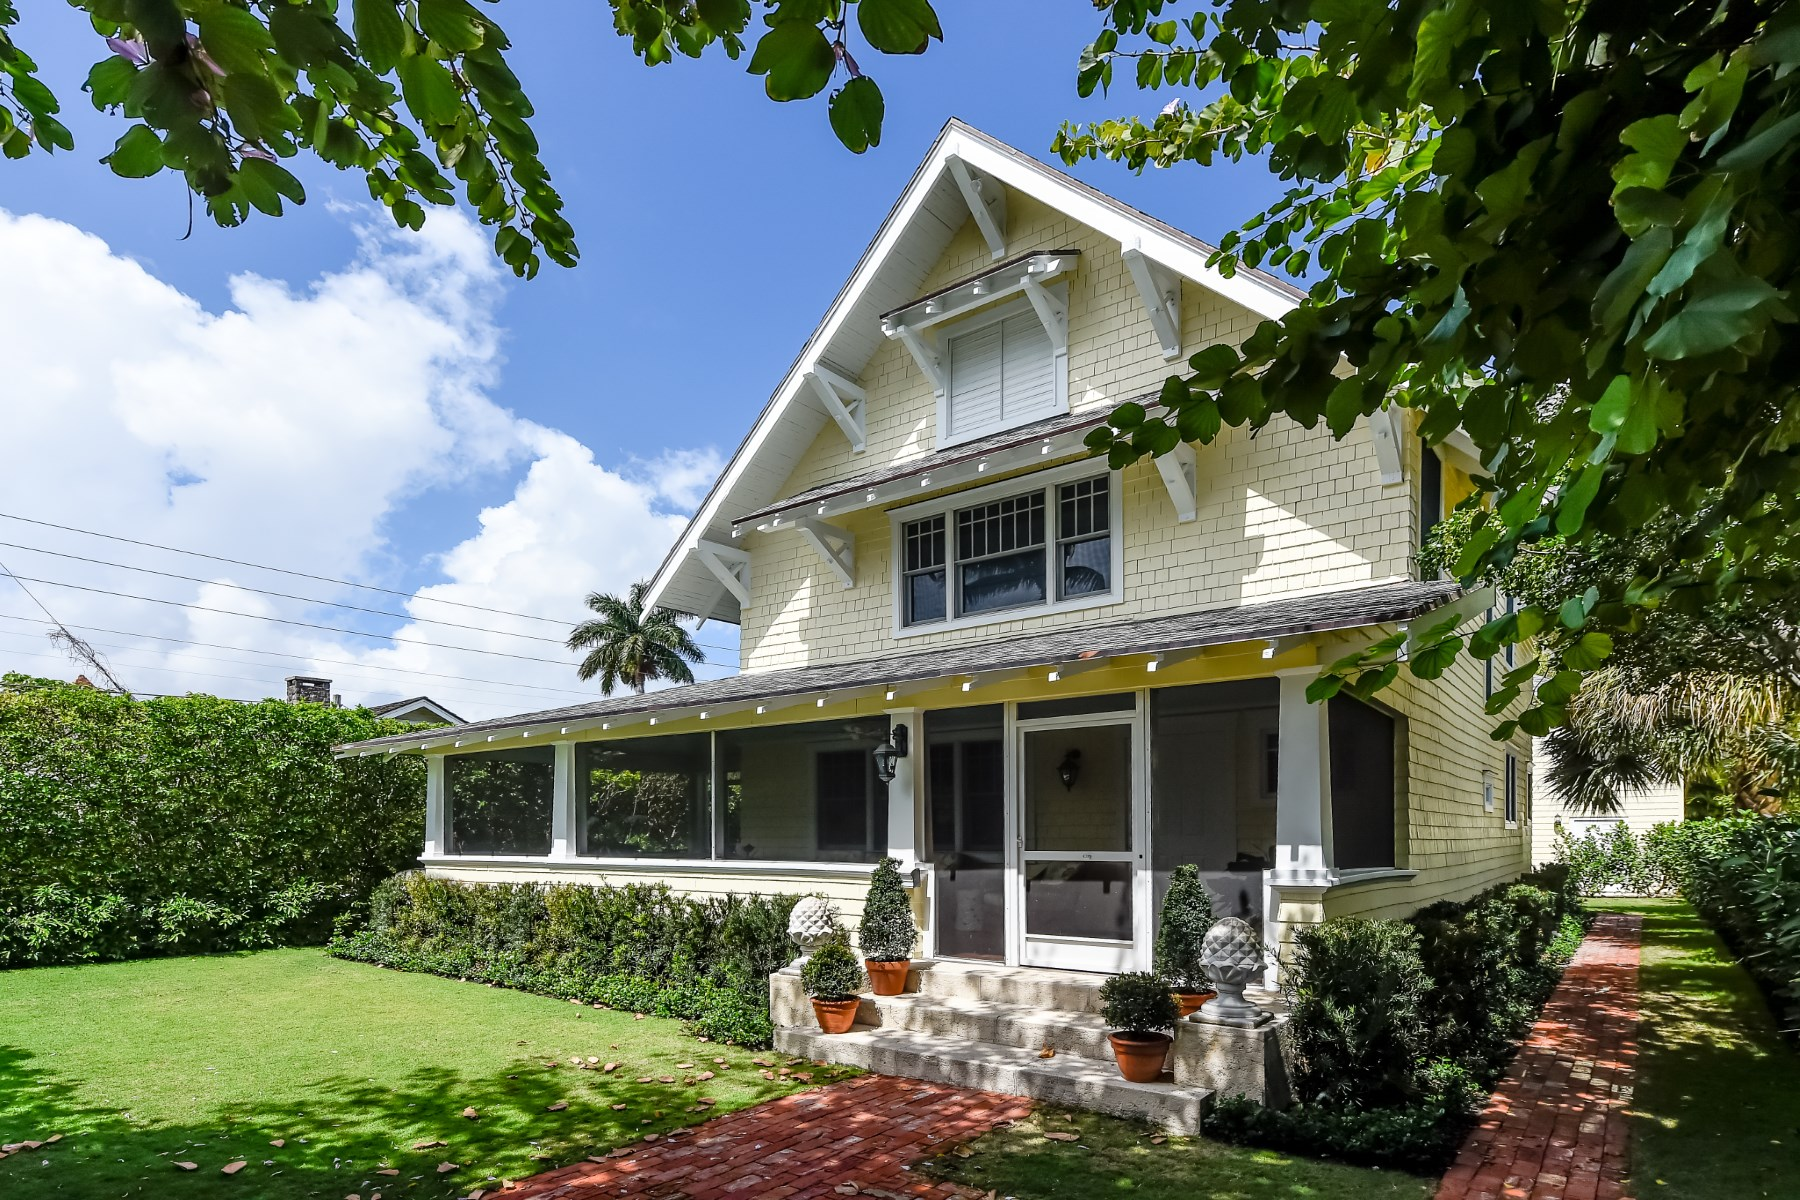 Casa Unifamiliar por un Venta en Historic Seabreeze Cottages 357 Seabreeze Ave Palm Beach, Florida 33480 Estados Unidos